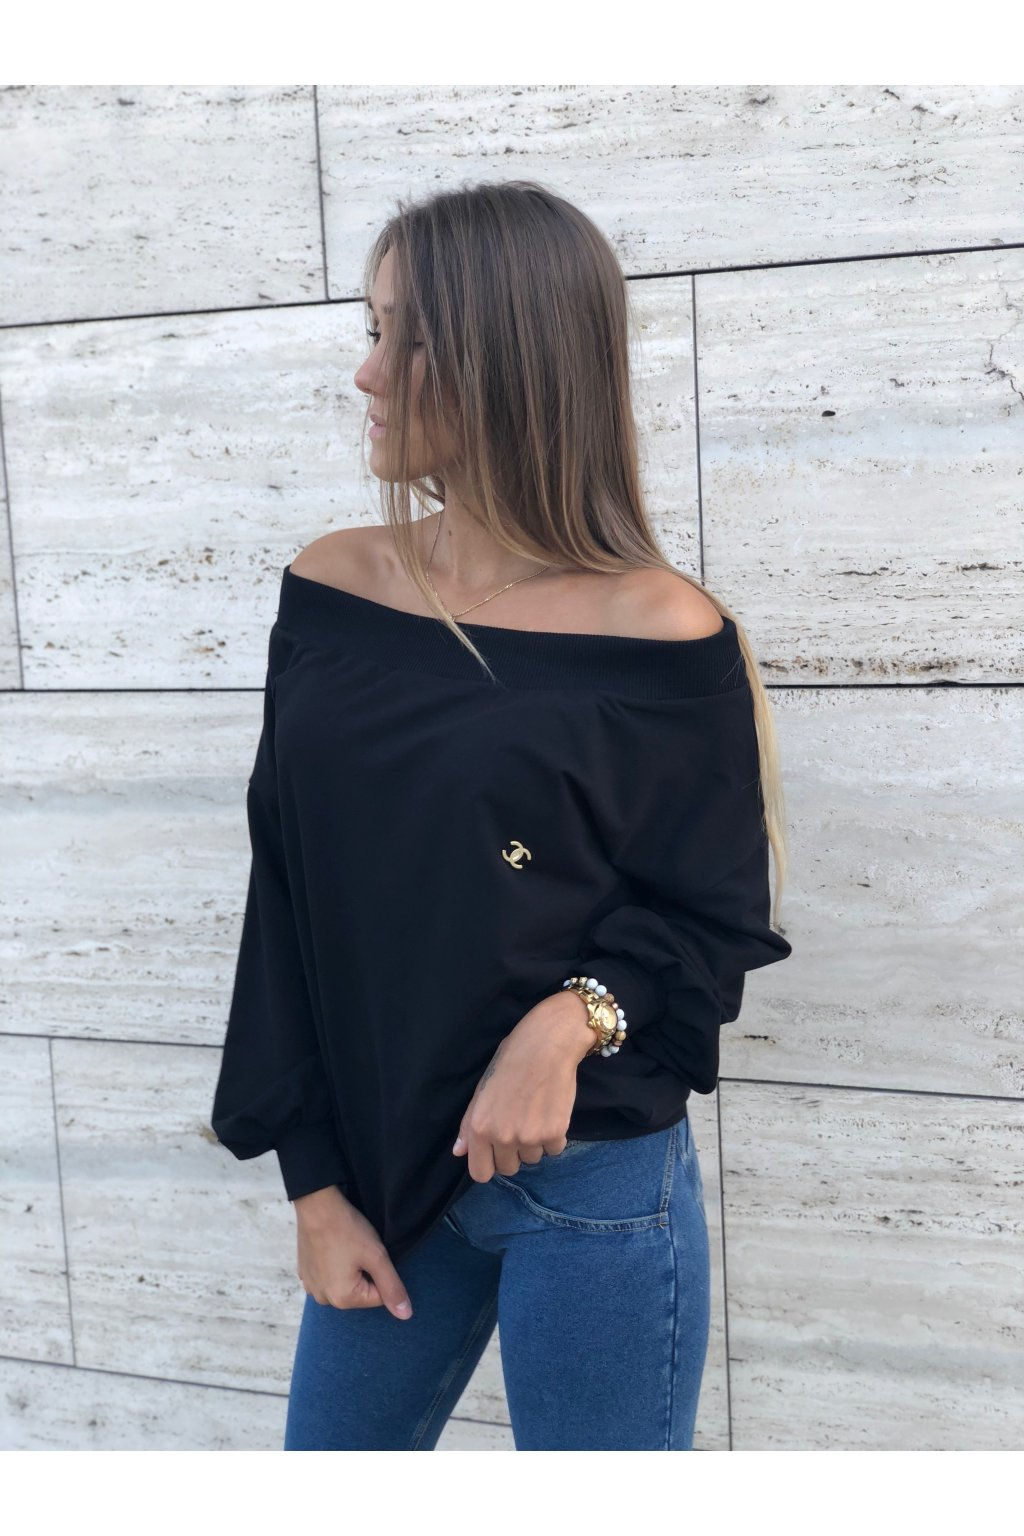 damska mikina luxury black eshopat cz 5